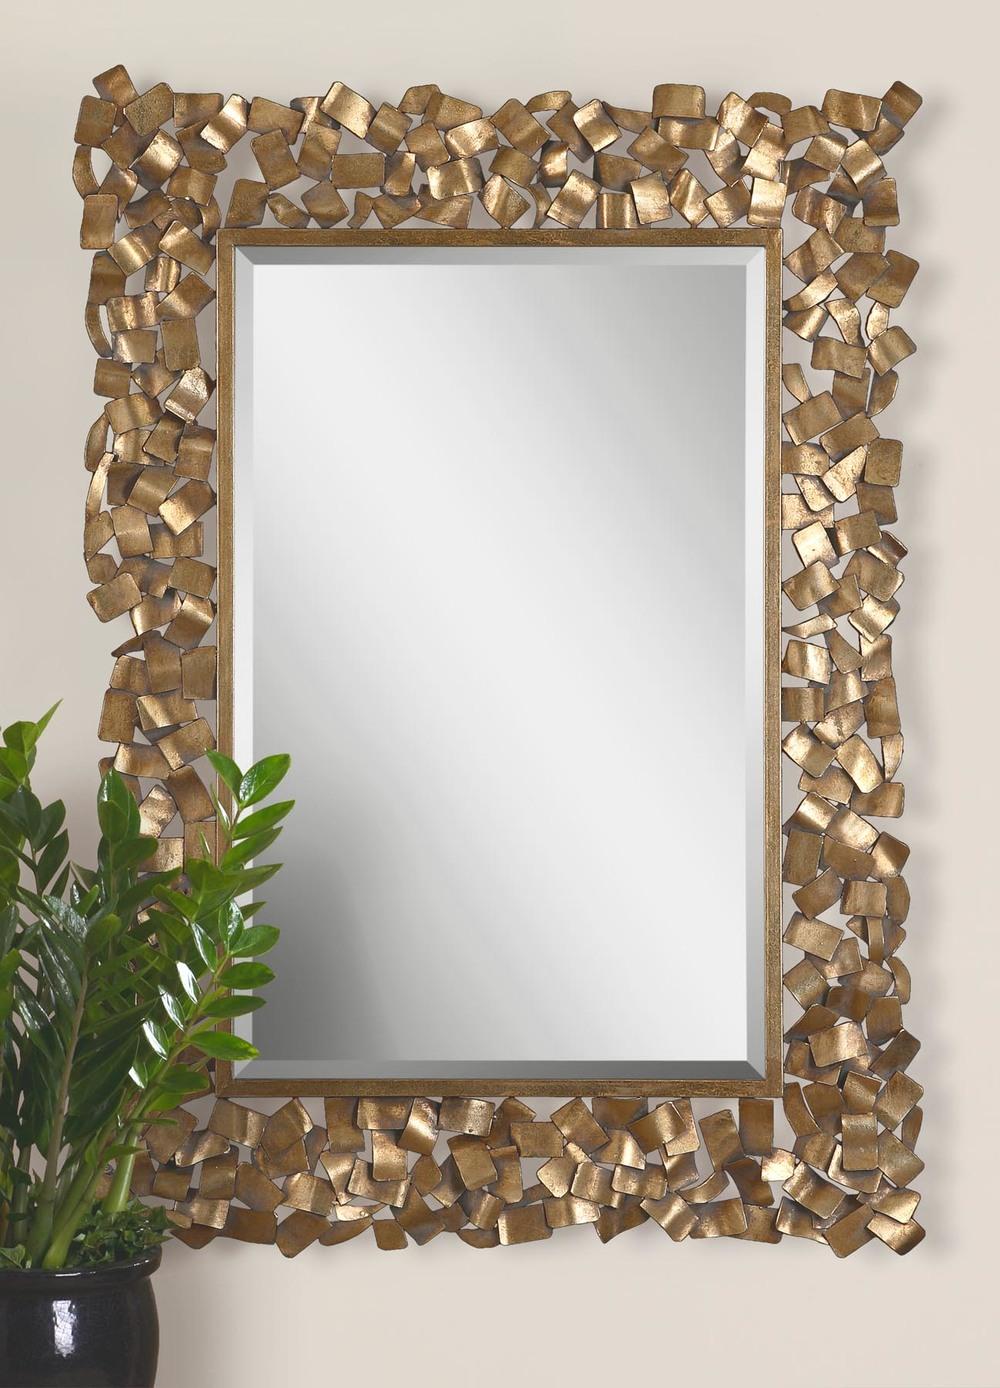 Uttermost Company - Capulin Mirror